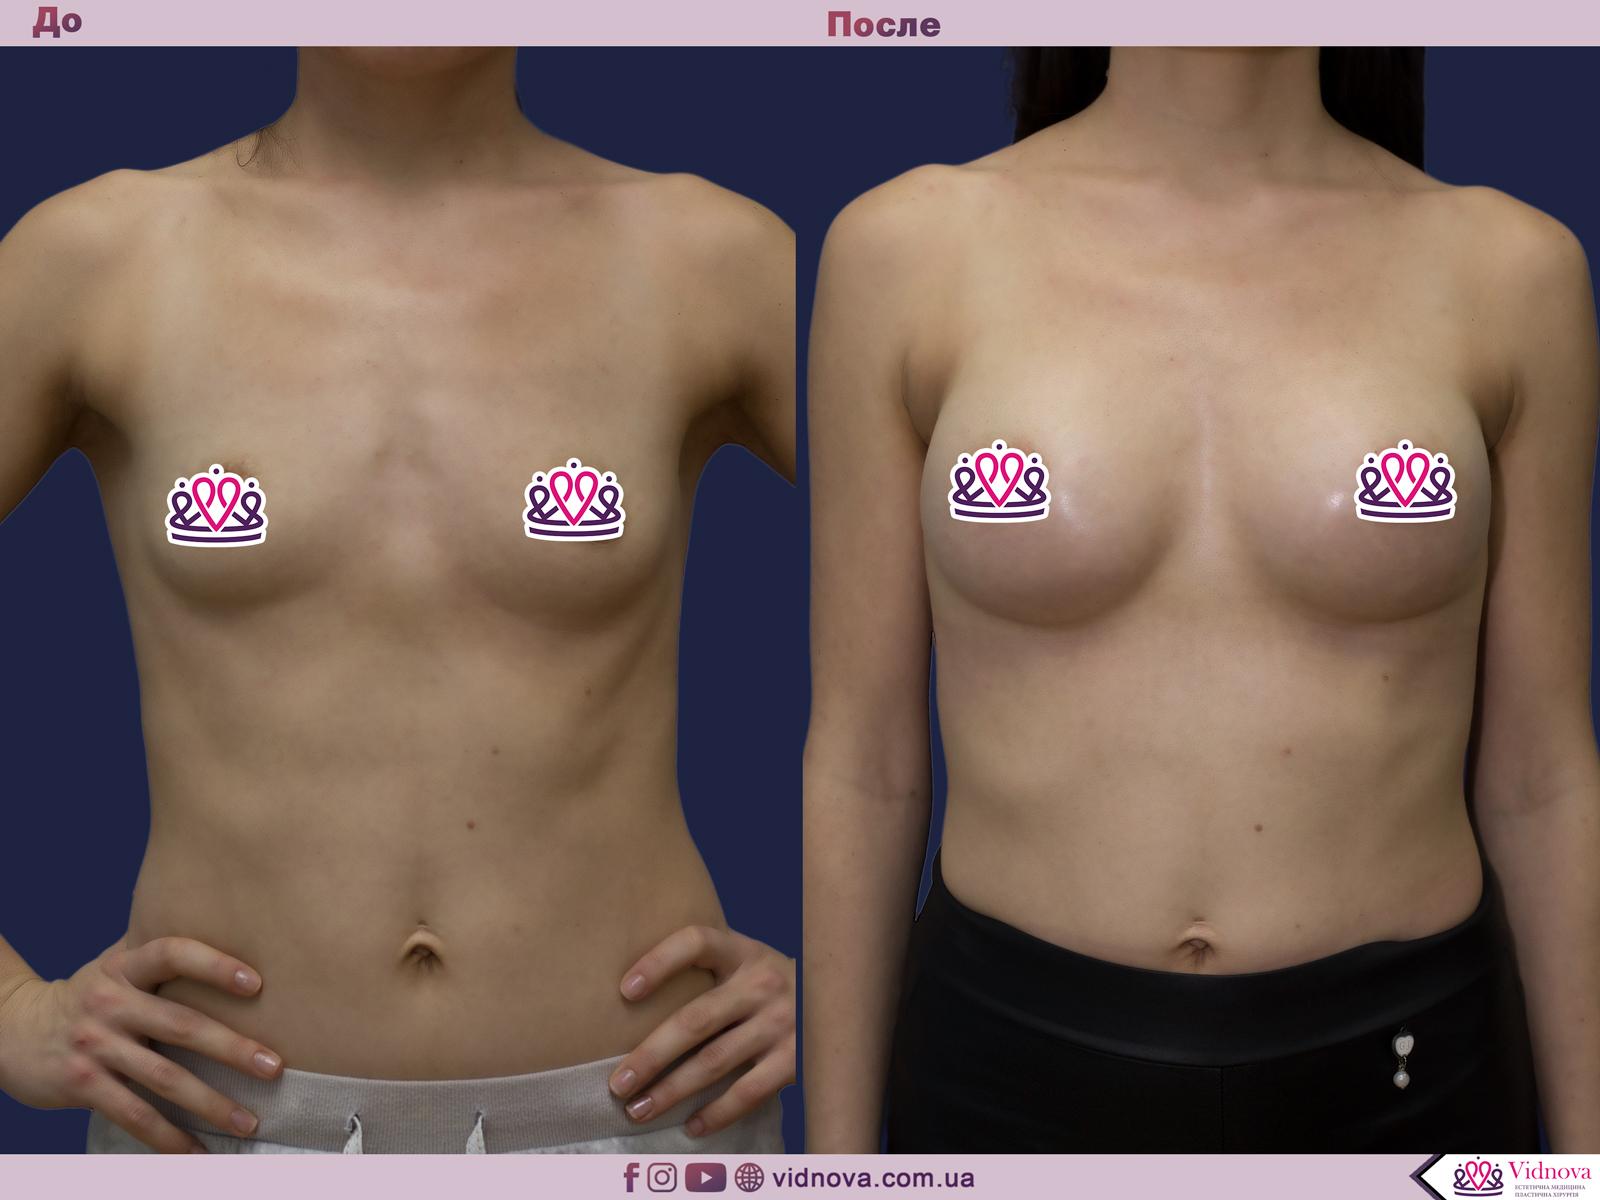 Увеличение груди: Фото ДО и ПОСЛЕ - Пример №79-1 - Клиника Vidnova